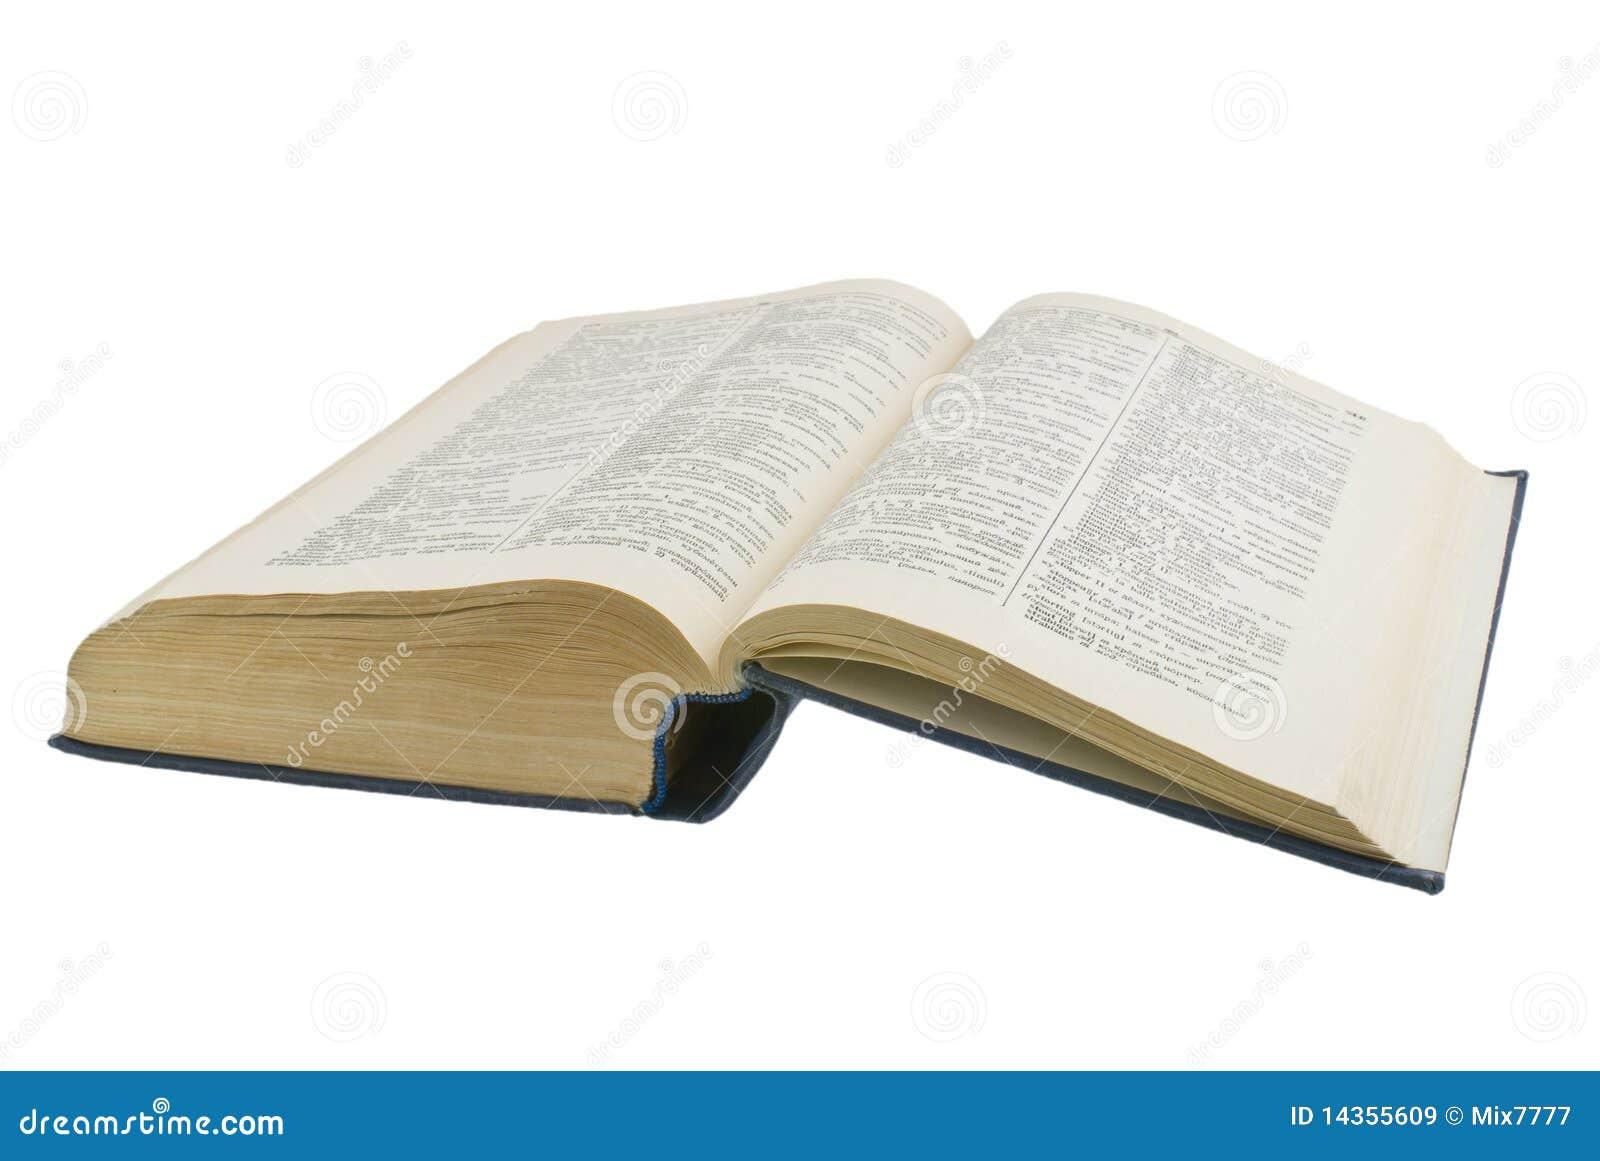 paper book binding